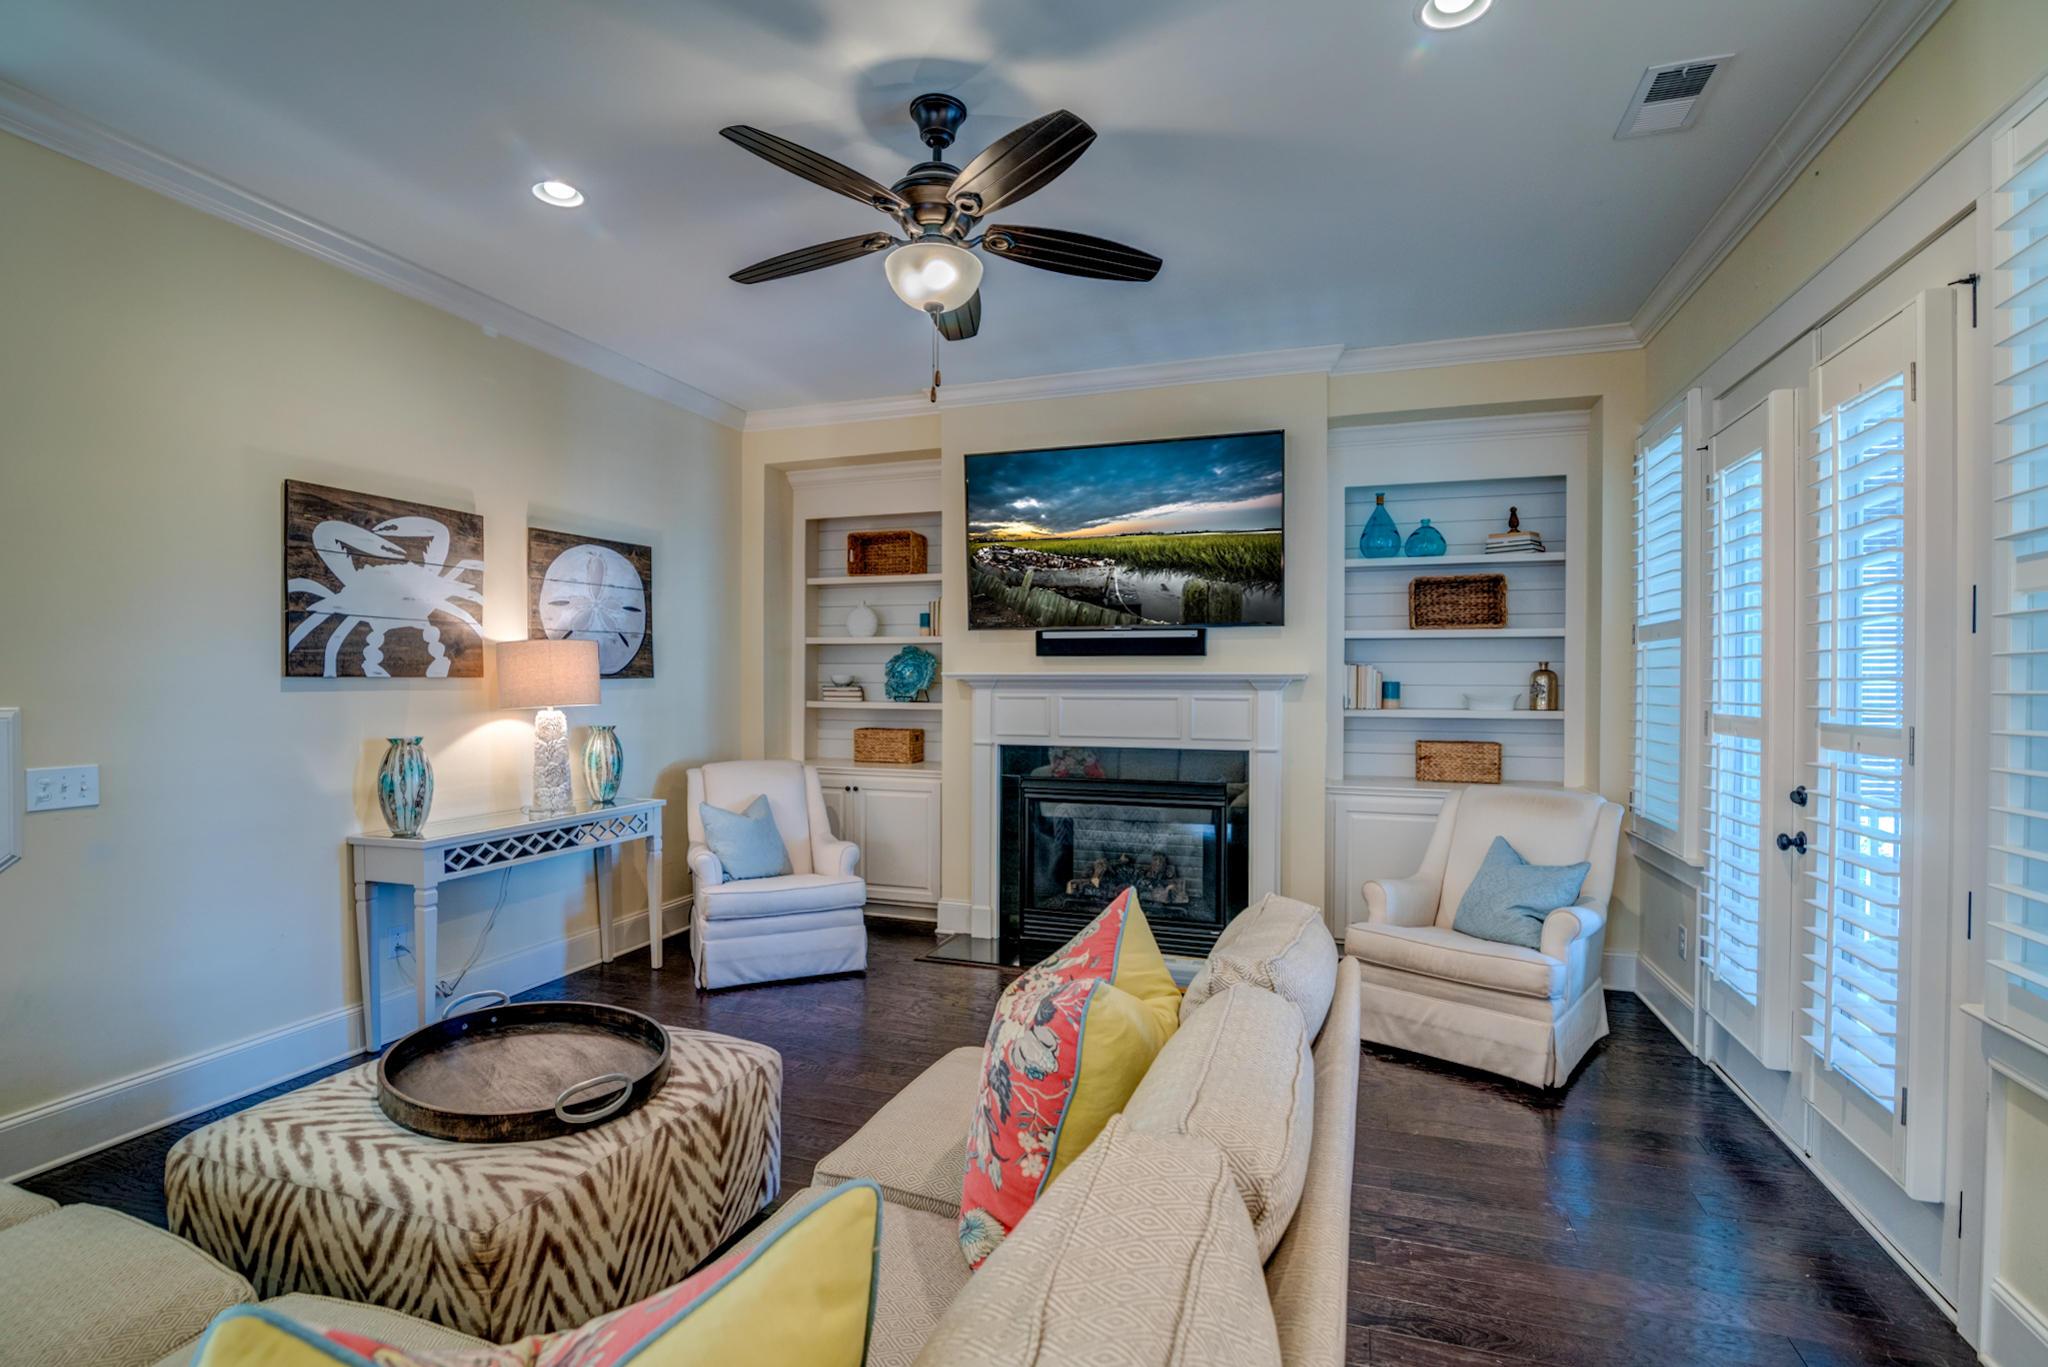 Daniel Island Smythe Park Homes For Sale - 1662 Pierce, Charleston, SC - 23